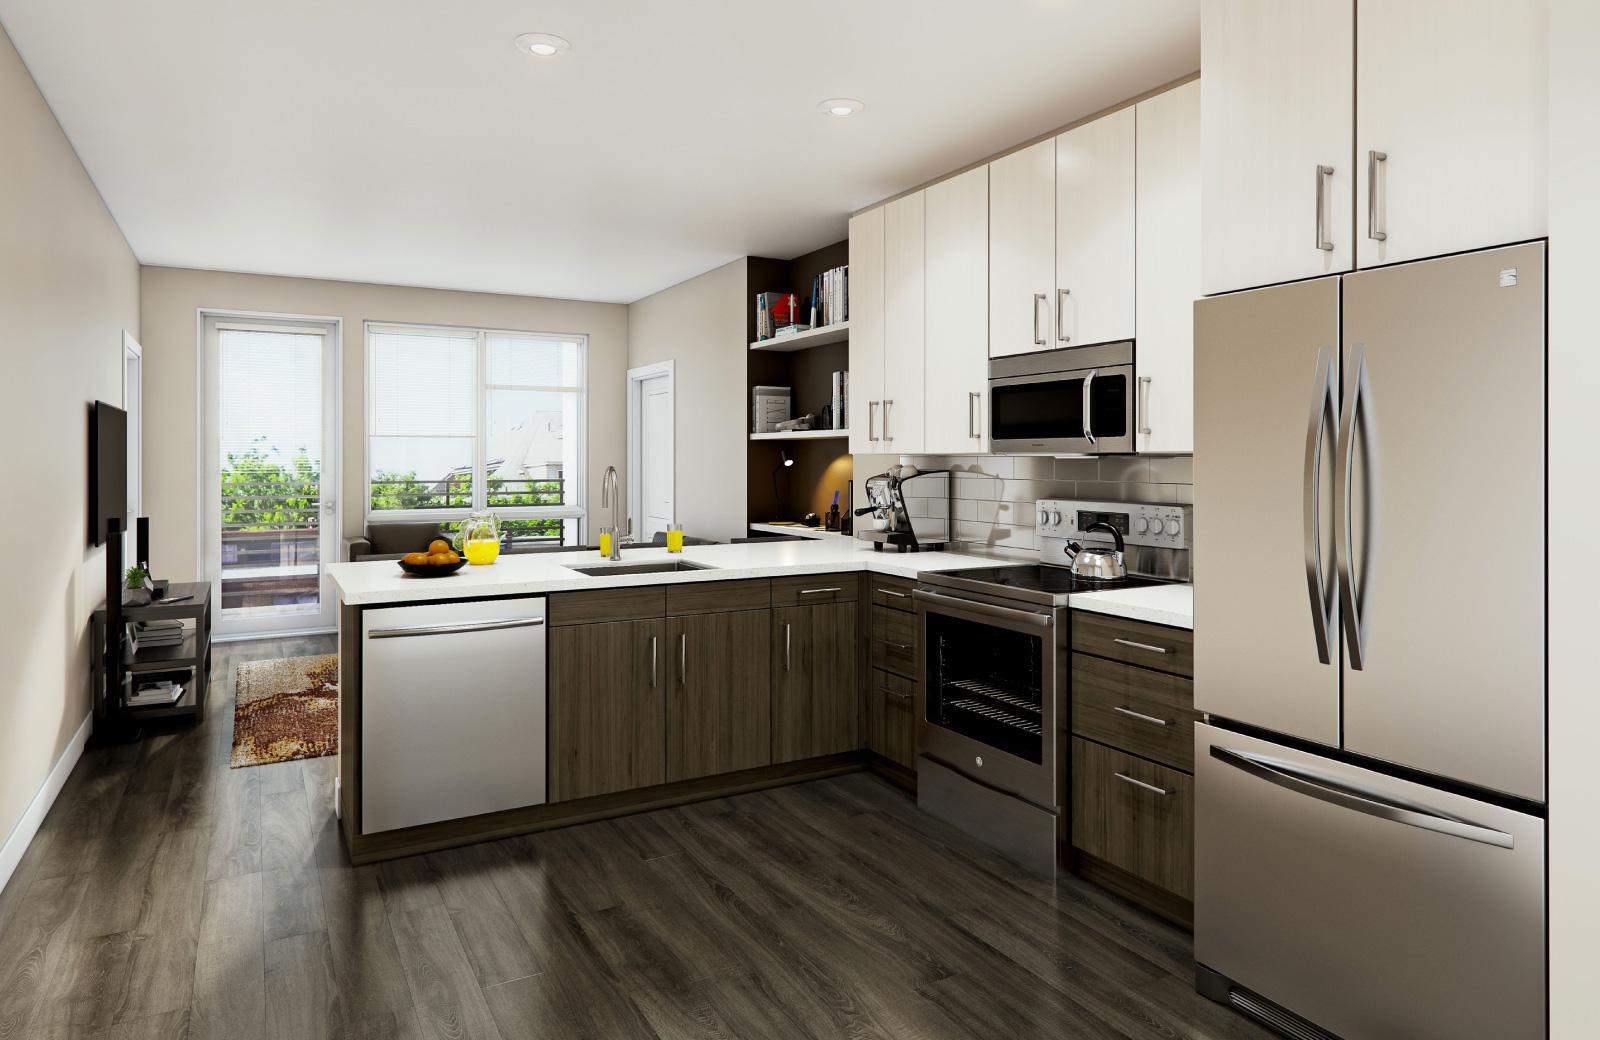 interiors at colab apartments